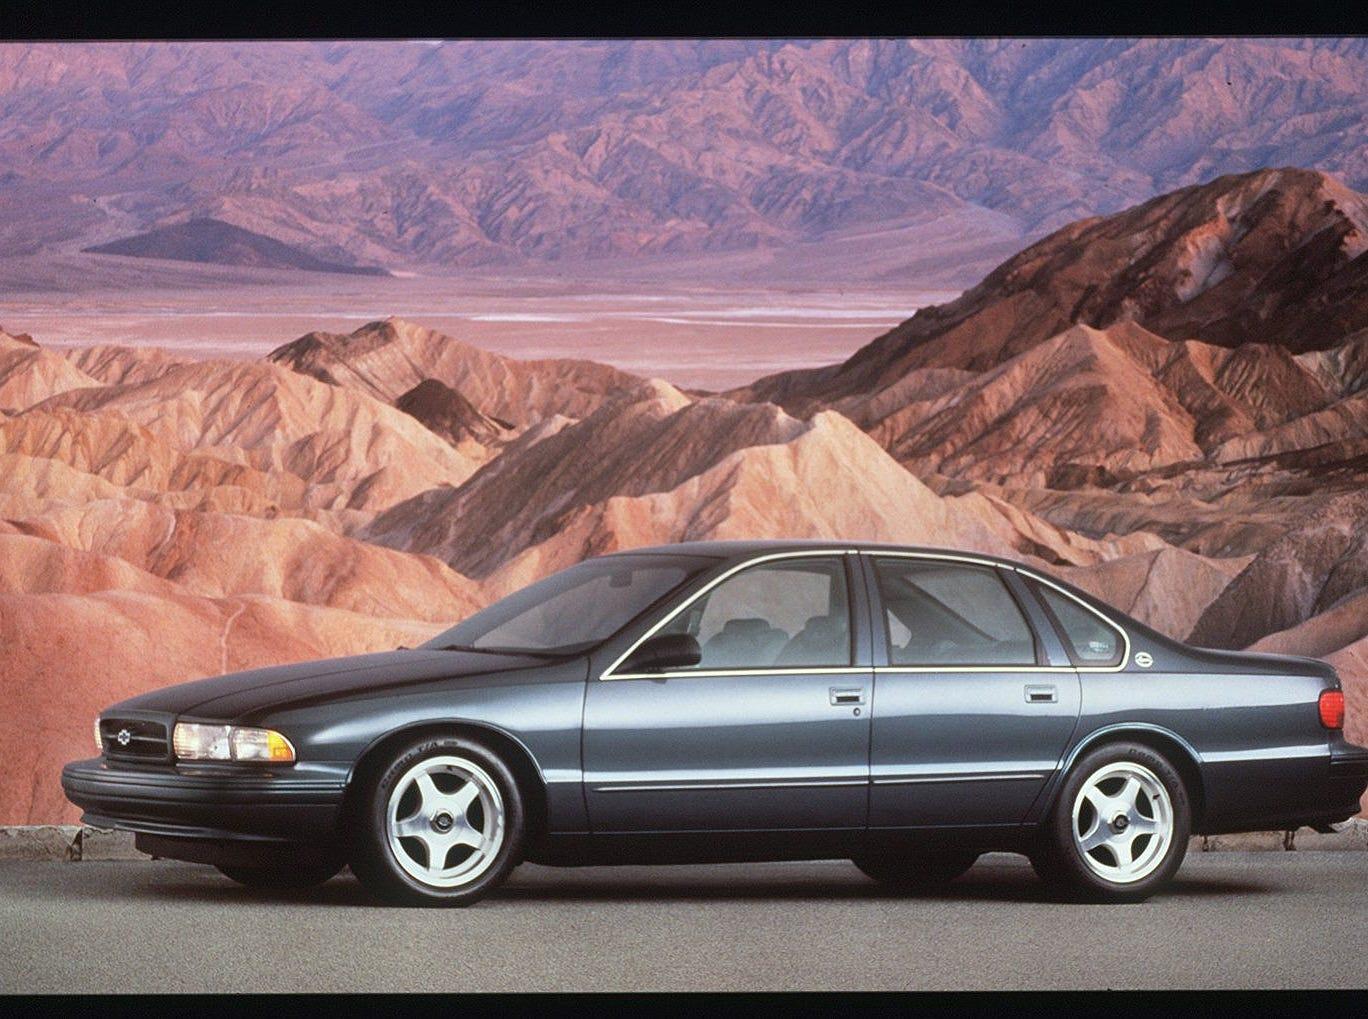 1995 Chevrolet Caprice Impala SS.